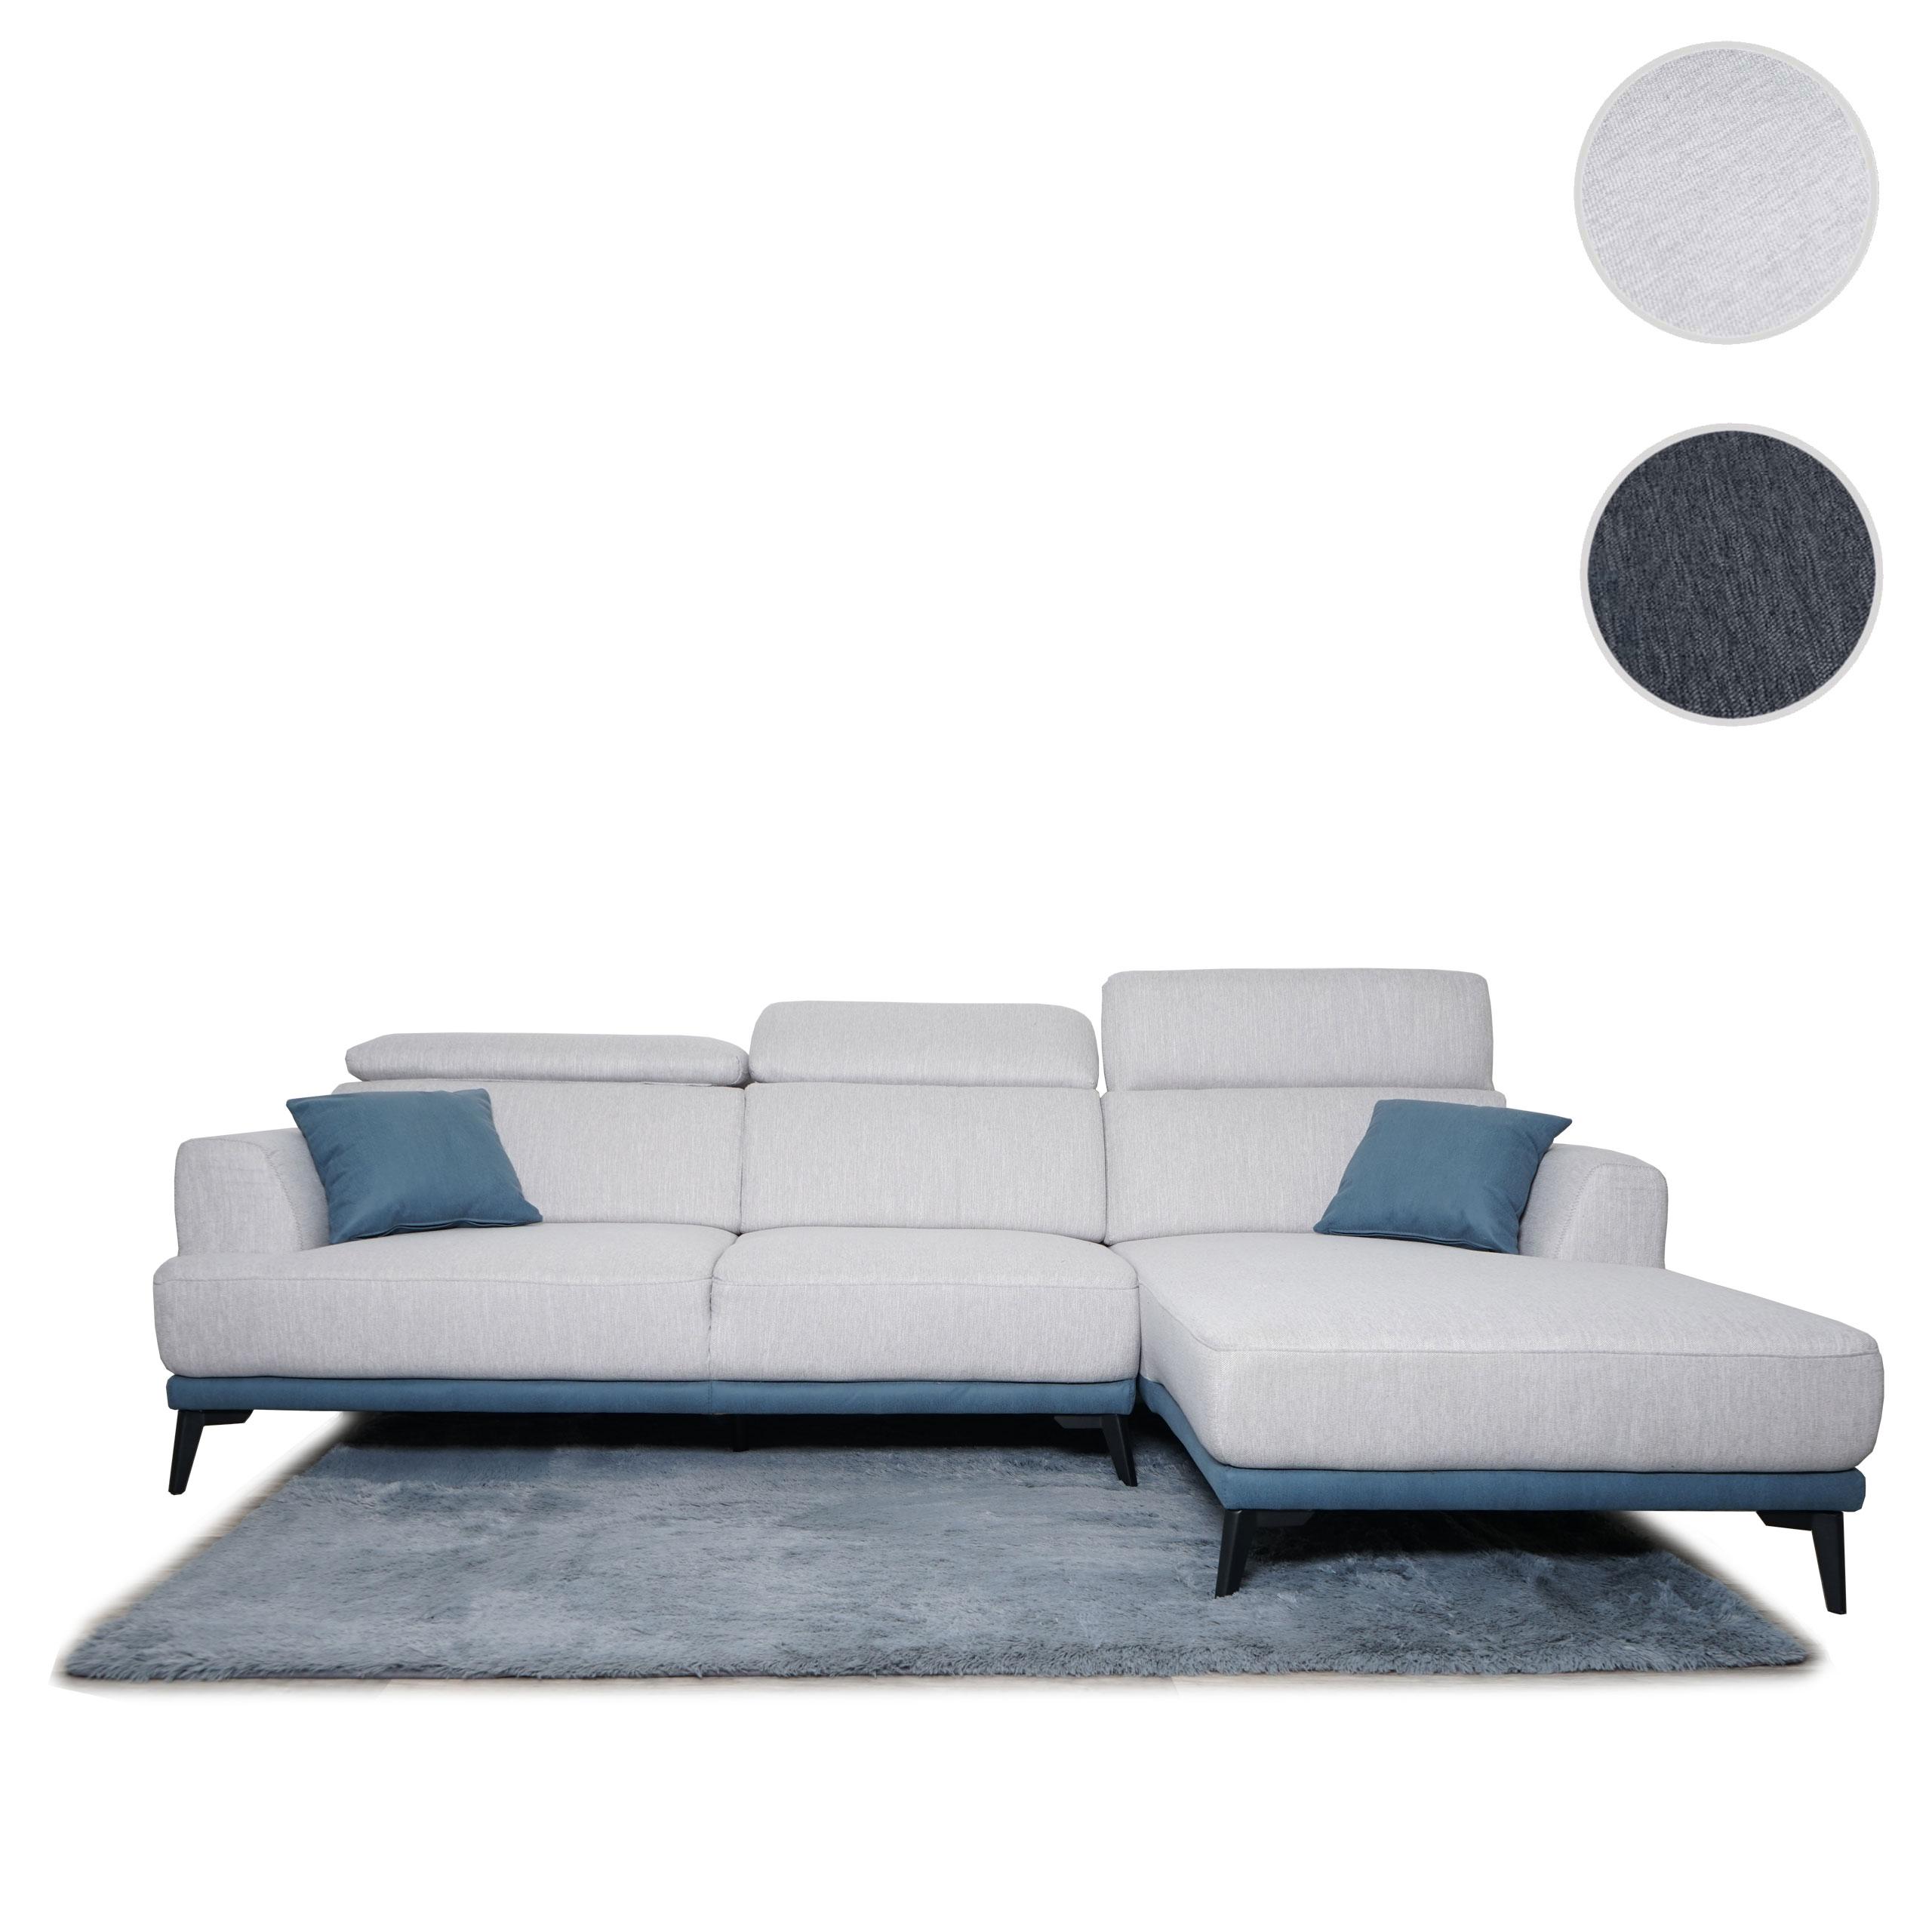 Mendler Sofa HWC-G44, Couch Ecksofa L-Form, Liegefläche Nosagfederung Taschenfederkern Teppich verstellbar ~ 71519+71520+70293